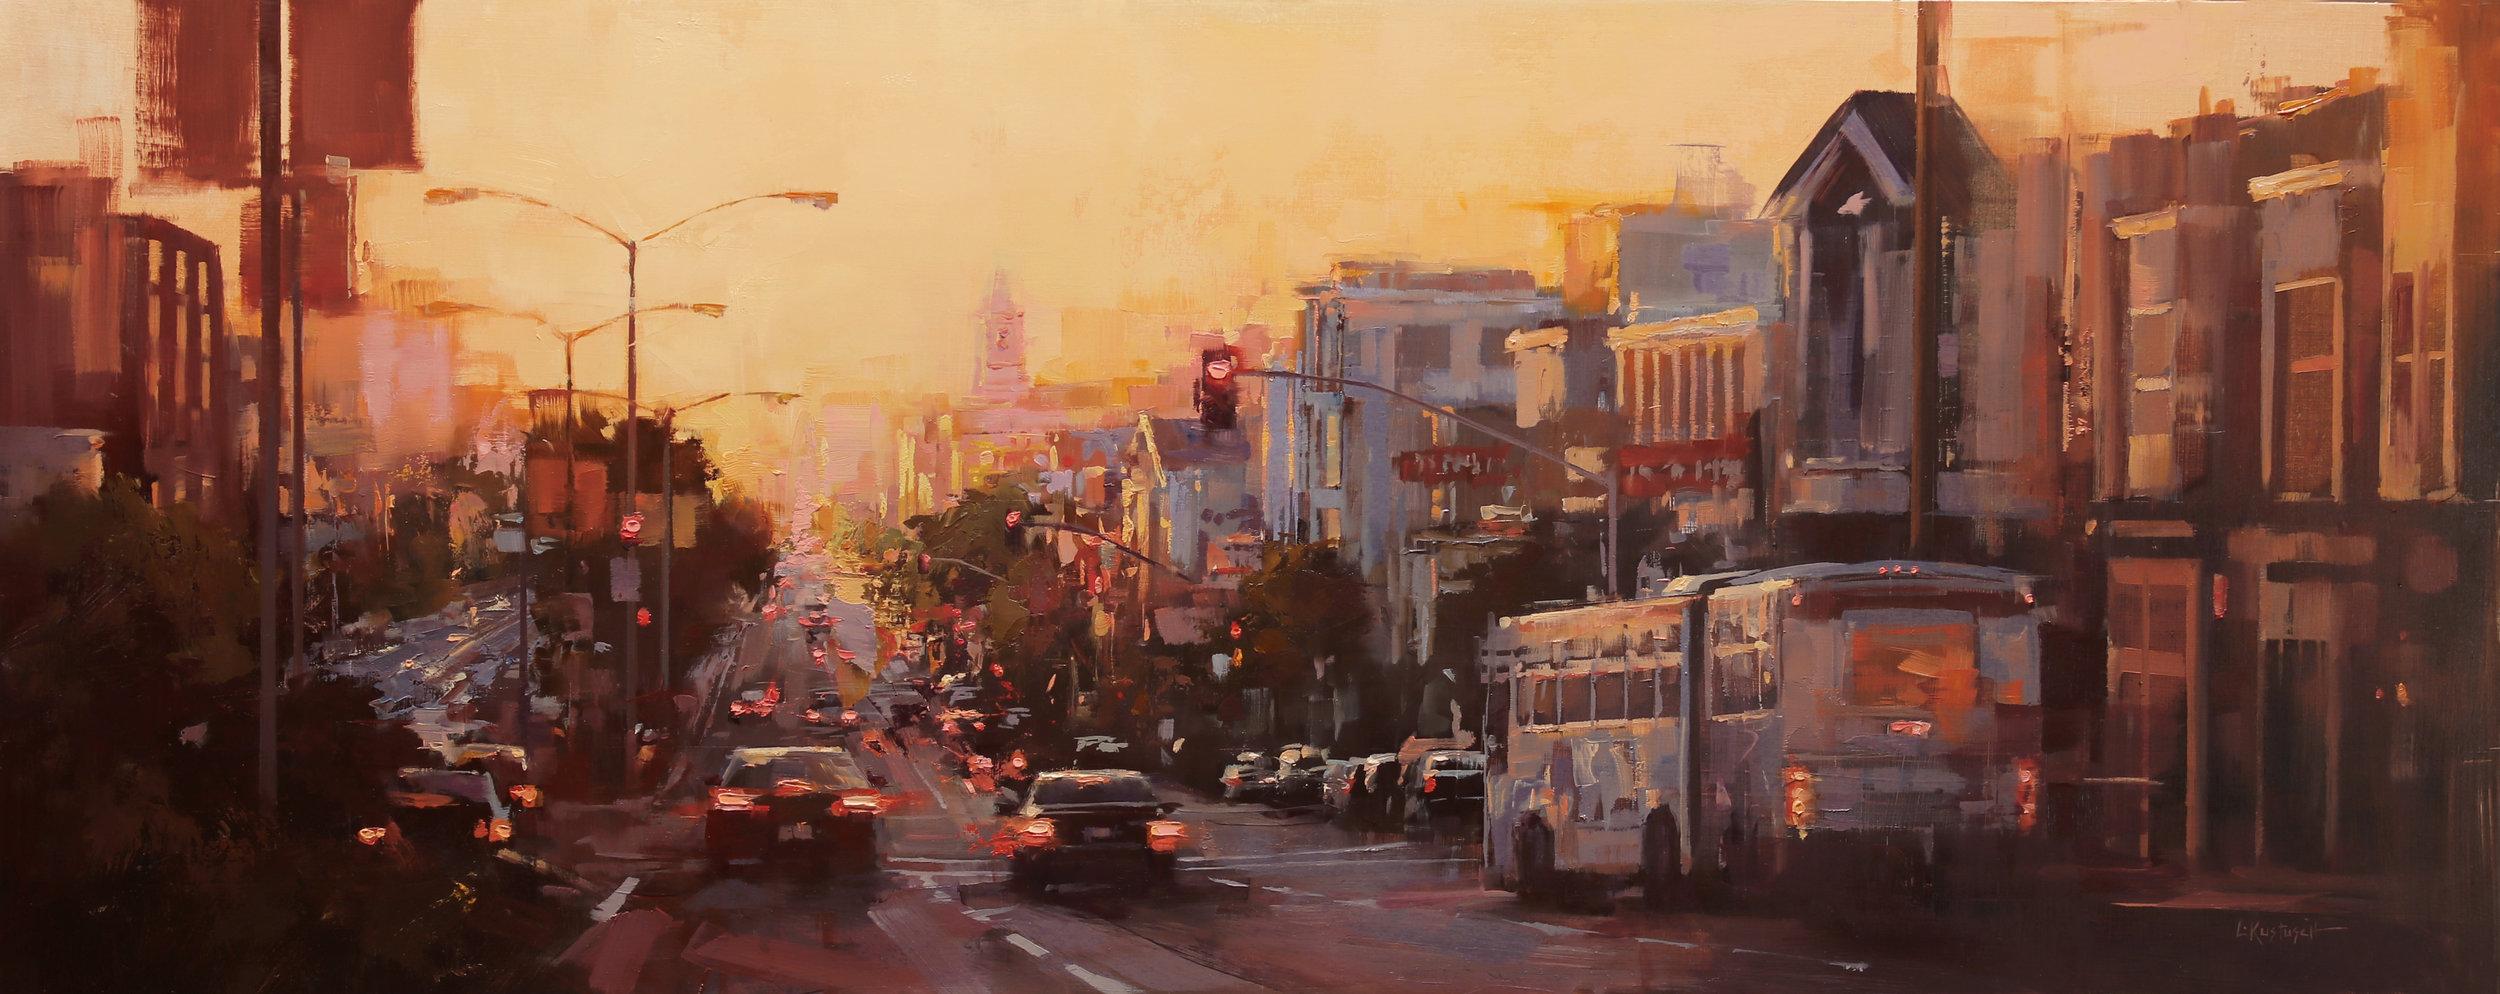 Lindsey Kustusch_%22Heading West at Last Light%22_14x35_oil on panel_$4,200.jpg